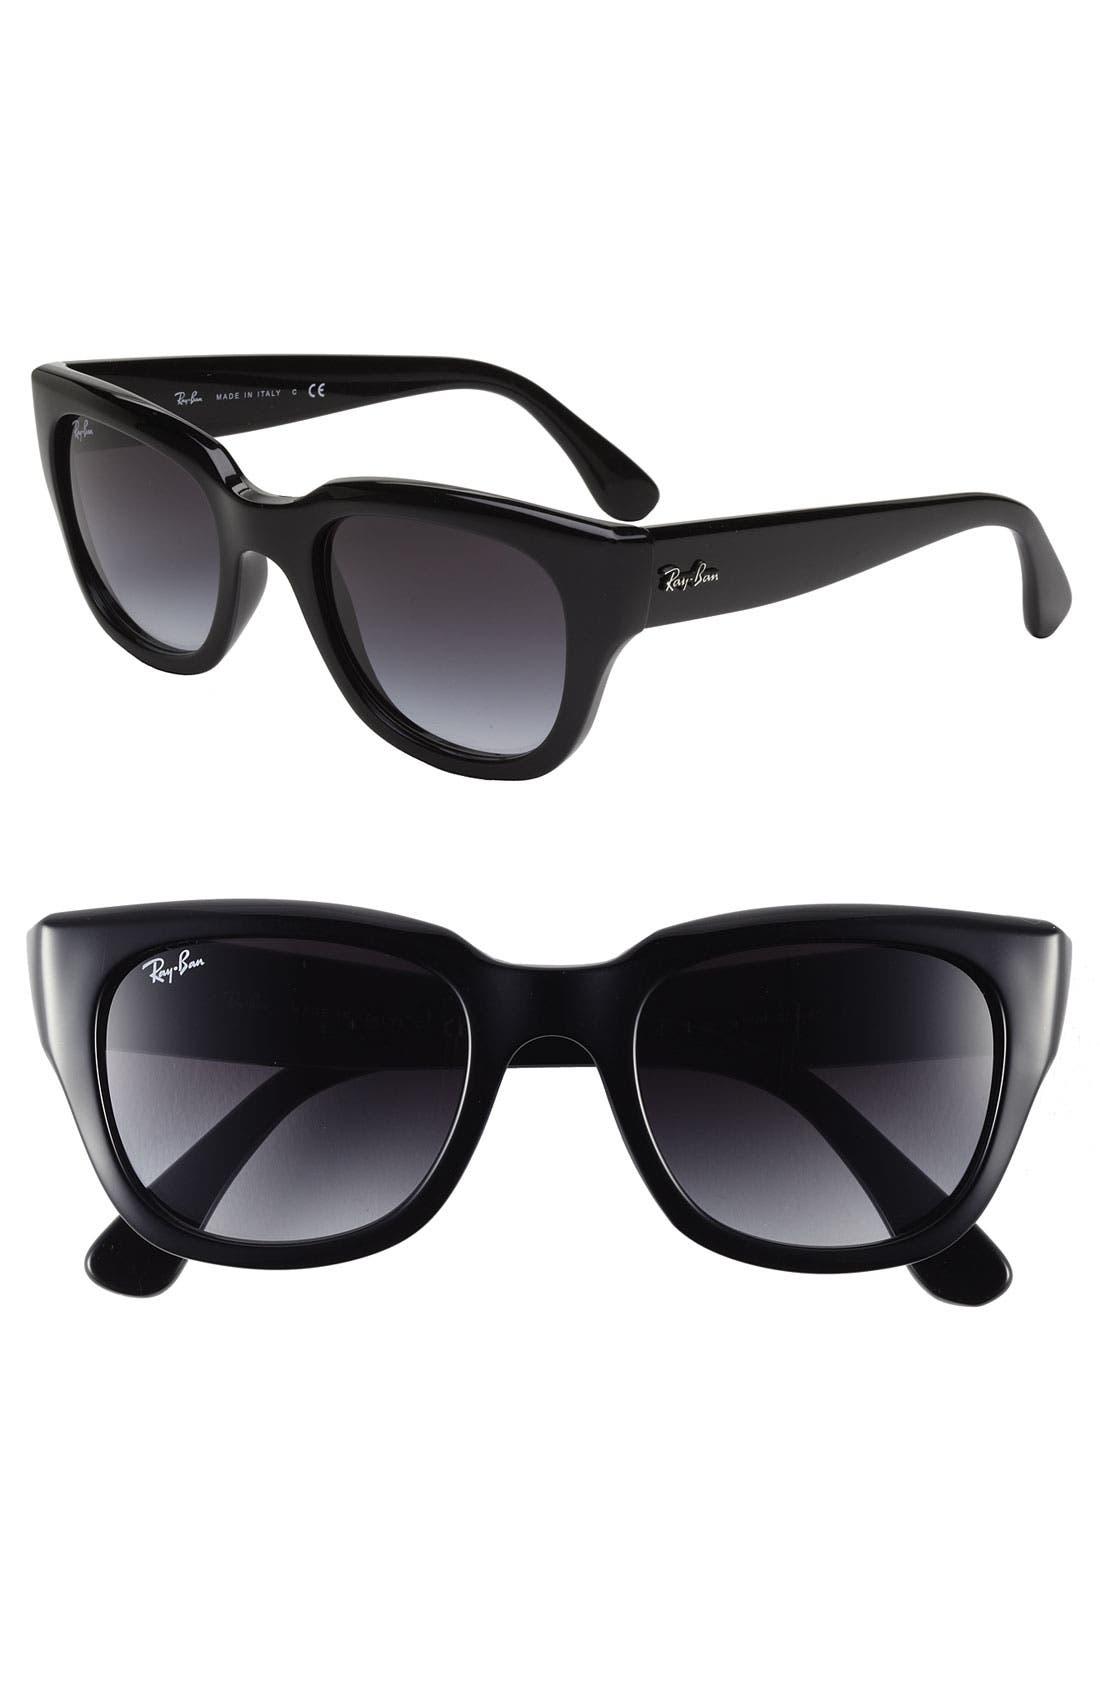 Main Image - Ray-Ban 52mm Retro Sunglasses